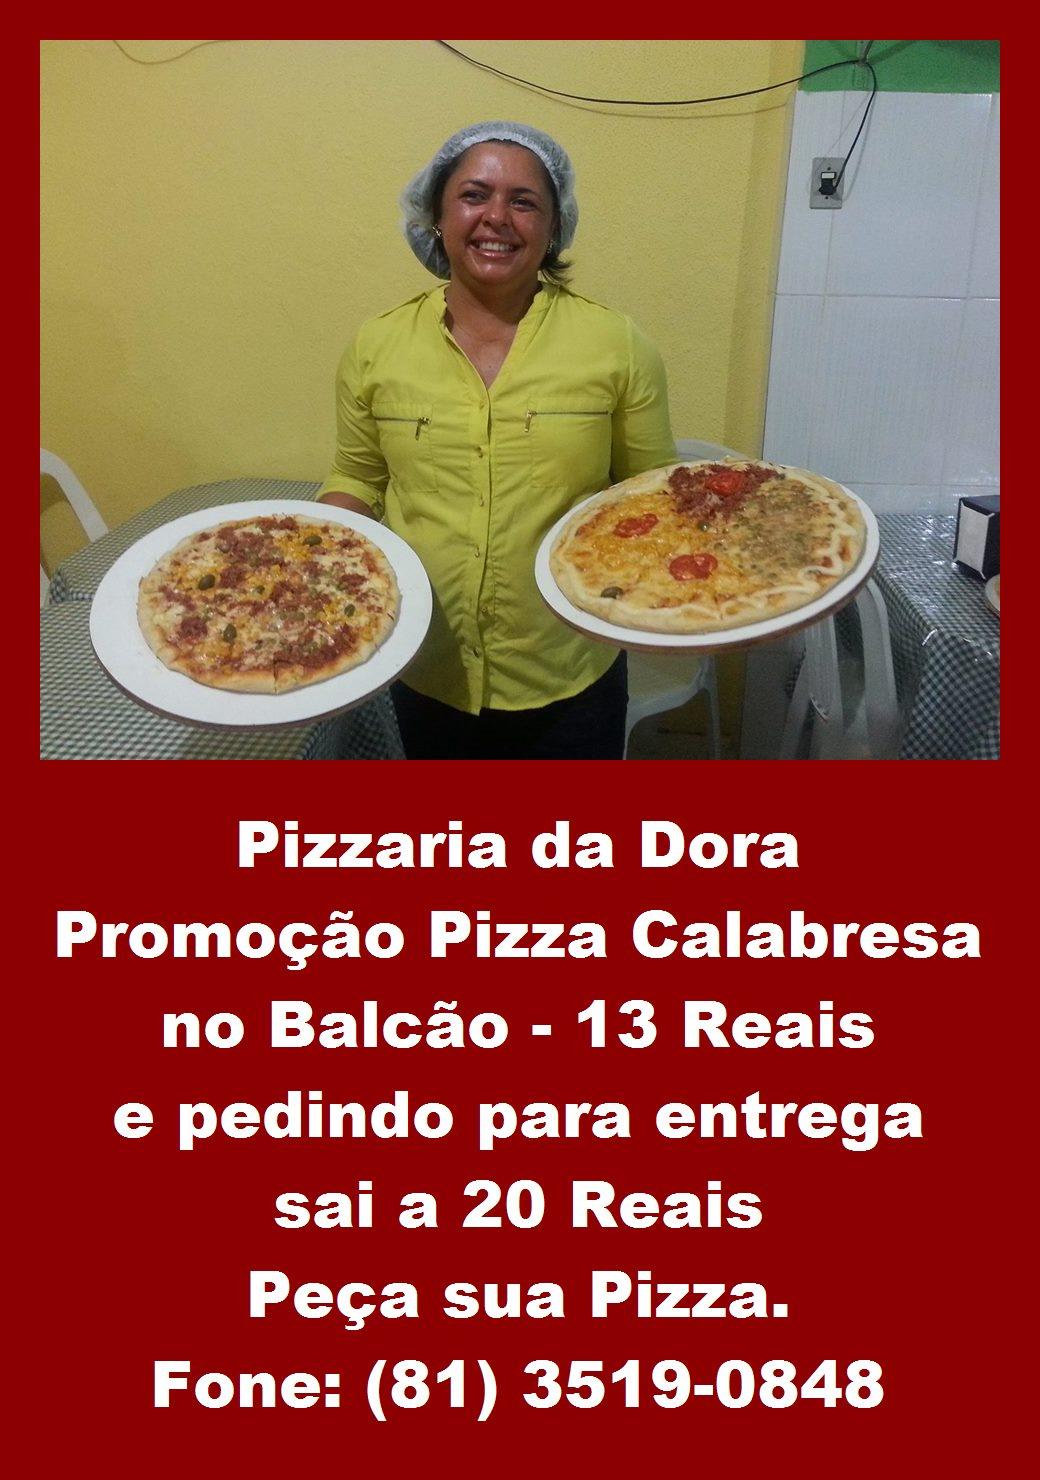 Pizzaria da Dora